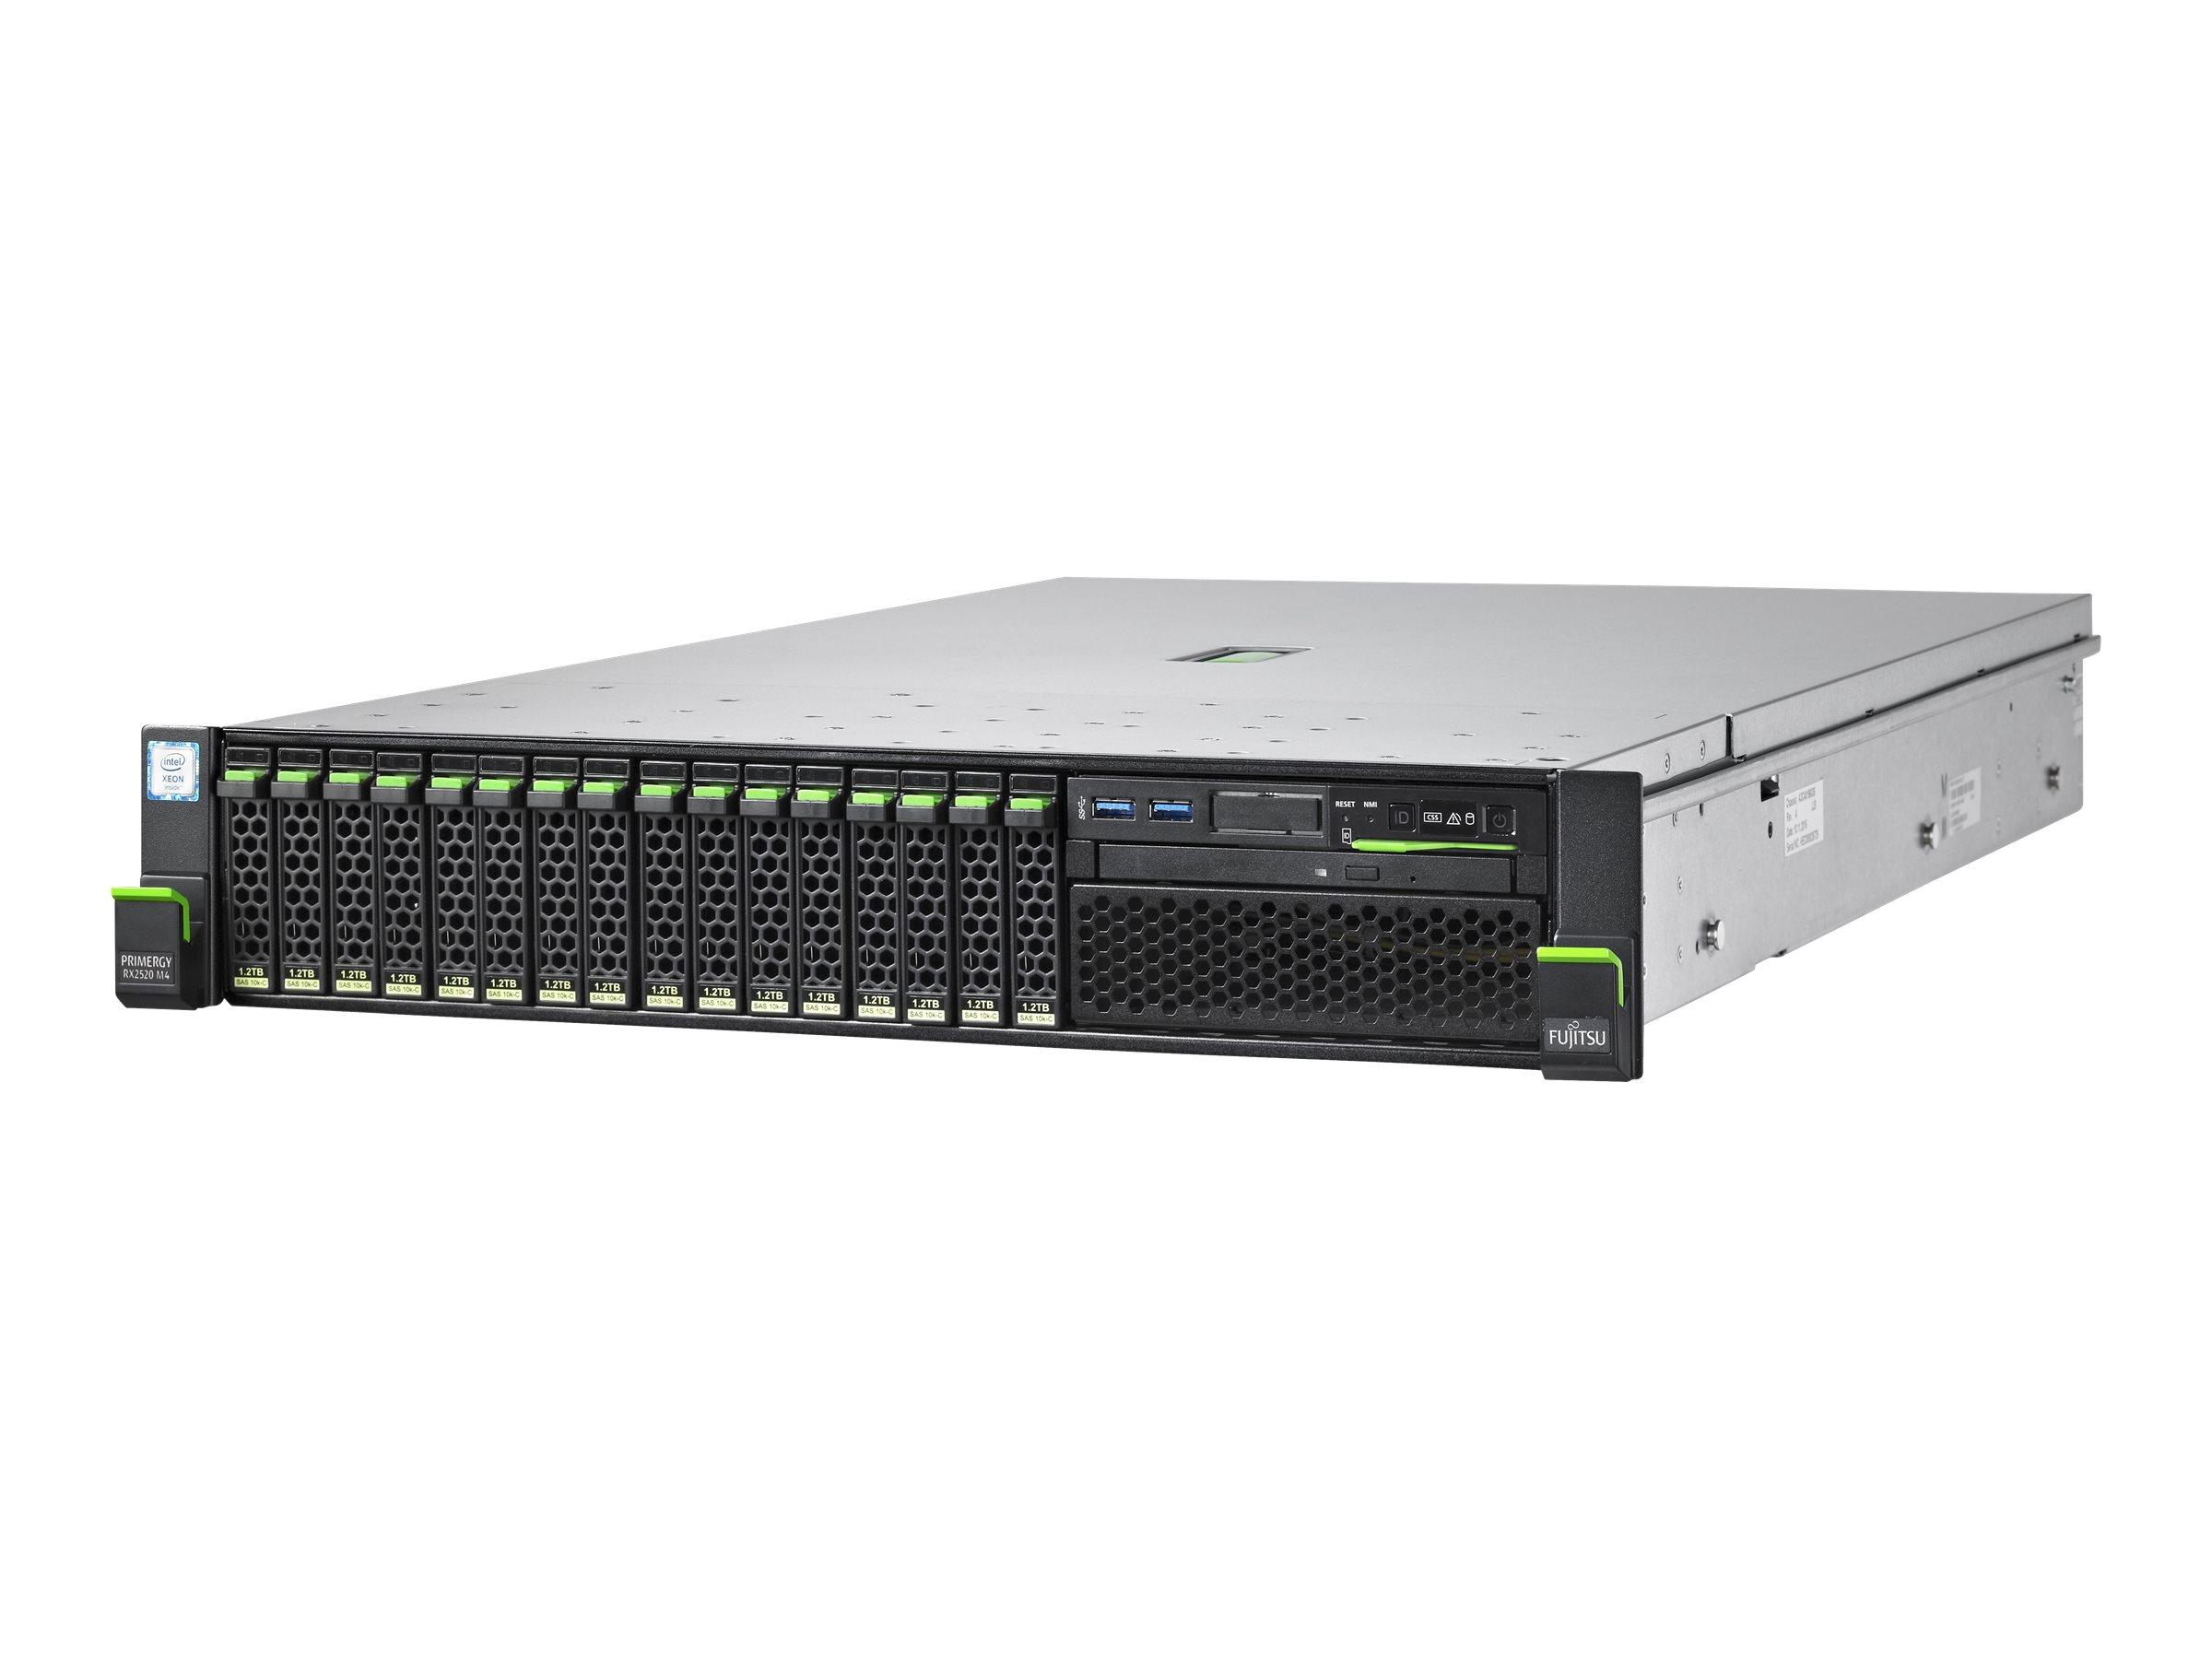 Fujitsu PRIMERGY RX2520 M4 - Server - Rack-Montage - 2U - zweiweg - 1 x Xeon Silver 4110 / 2.1 GHz - RAM 16 GB - SATA -